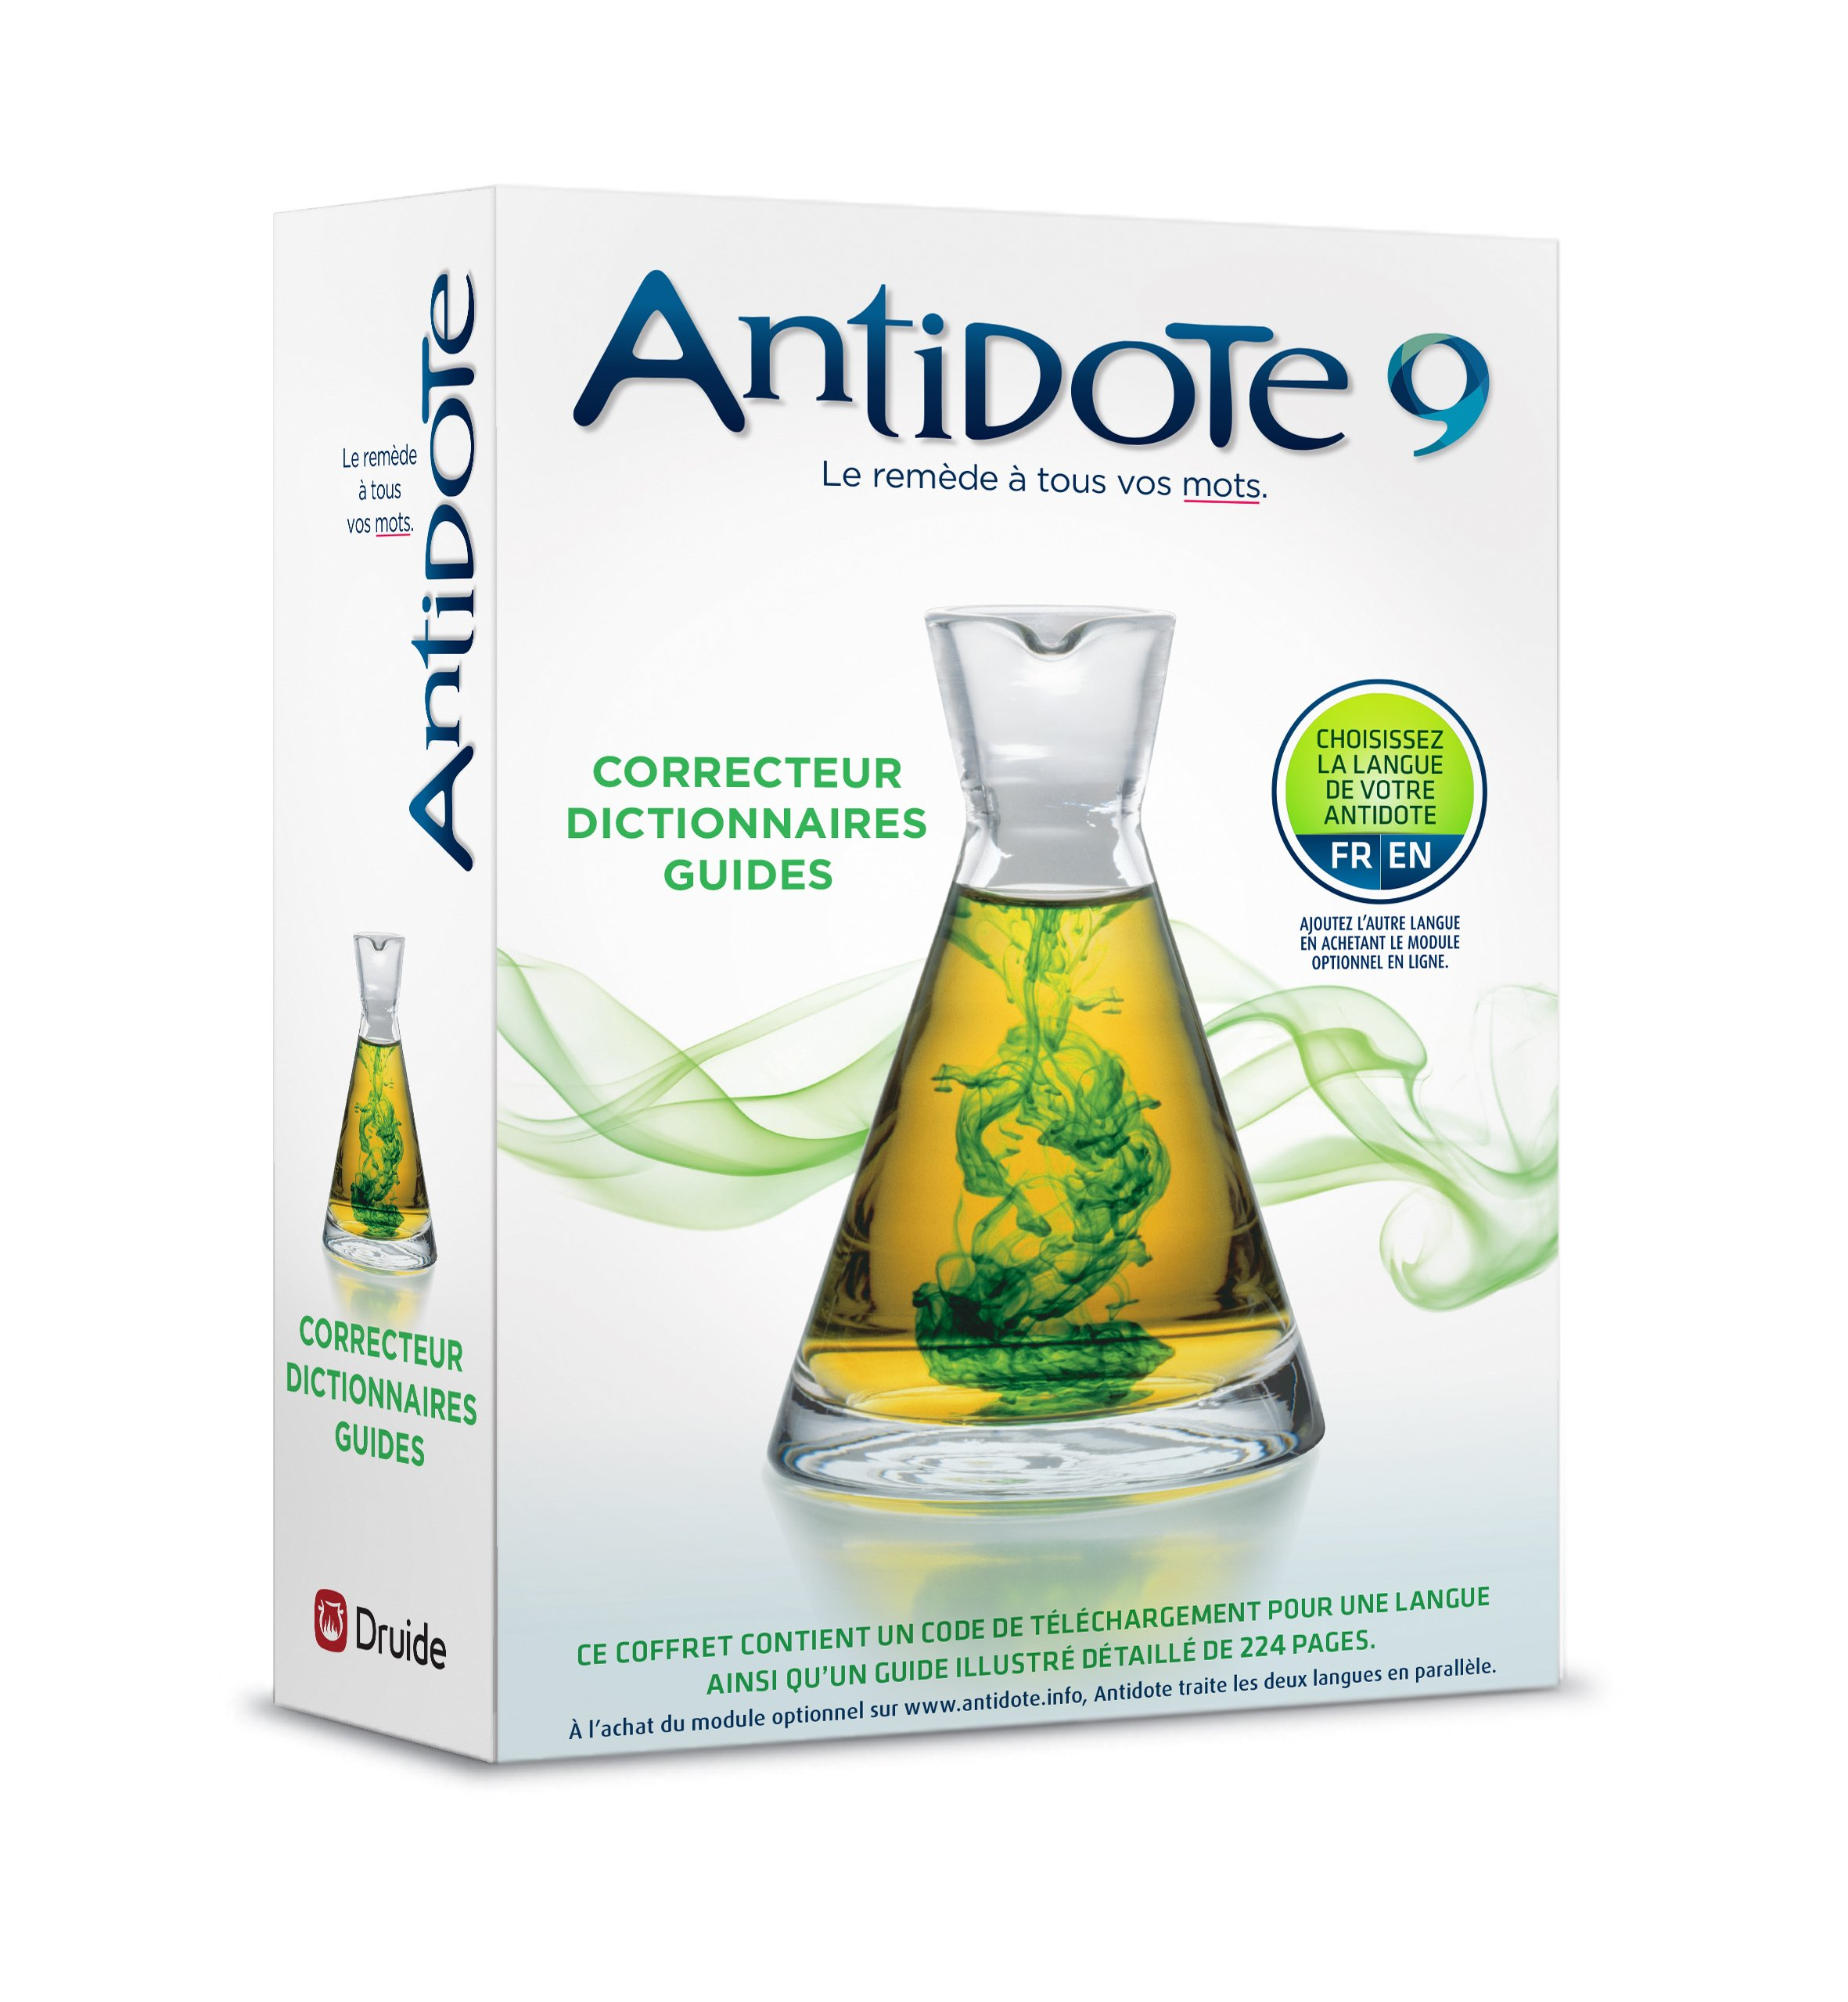 antidote druide